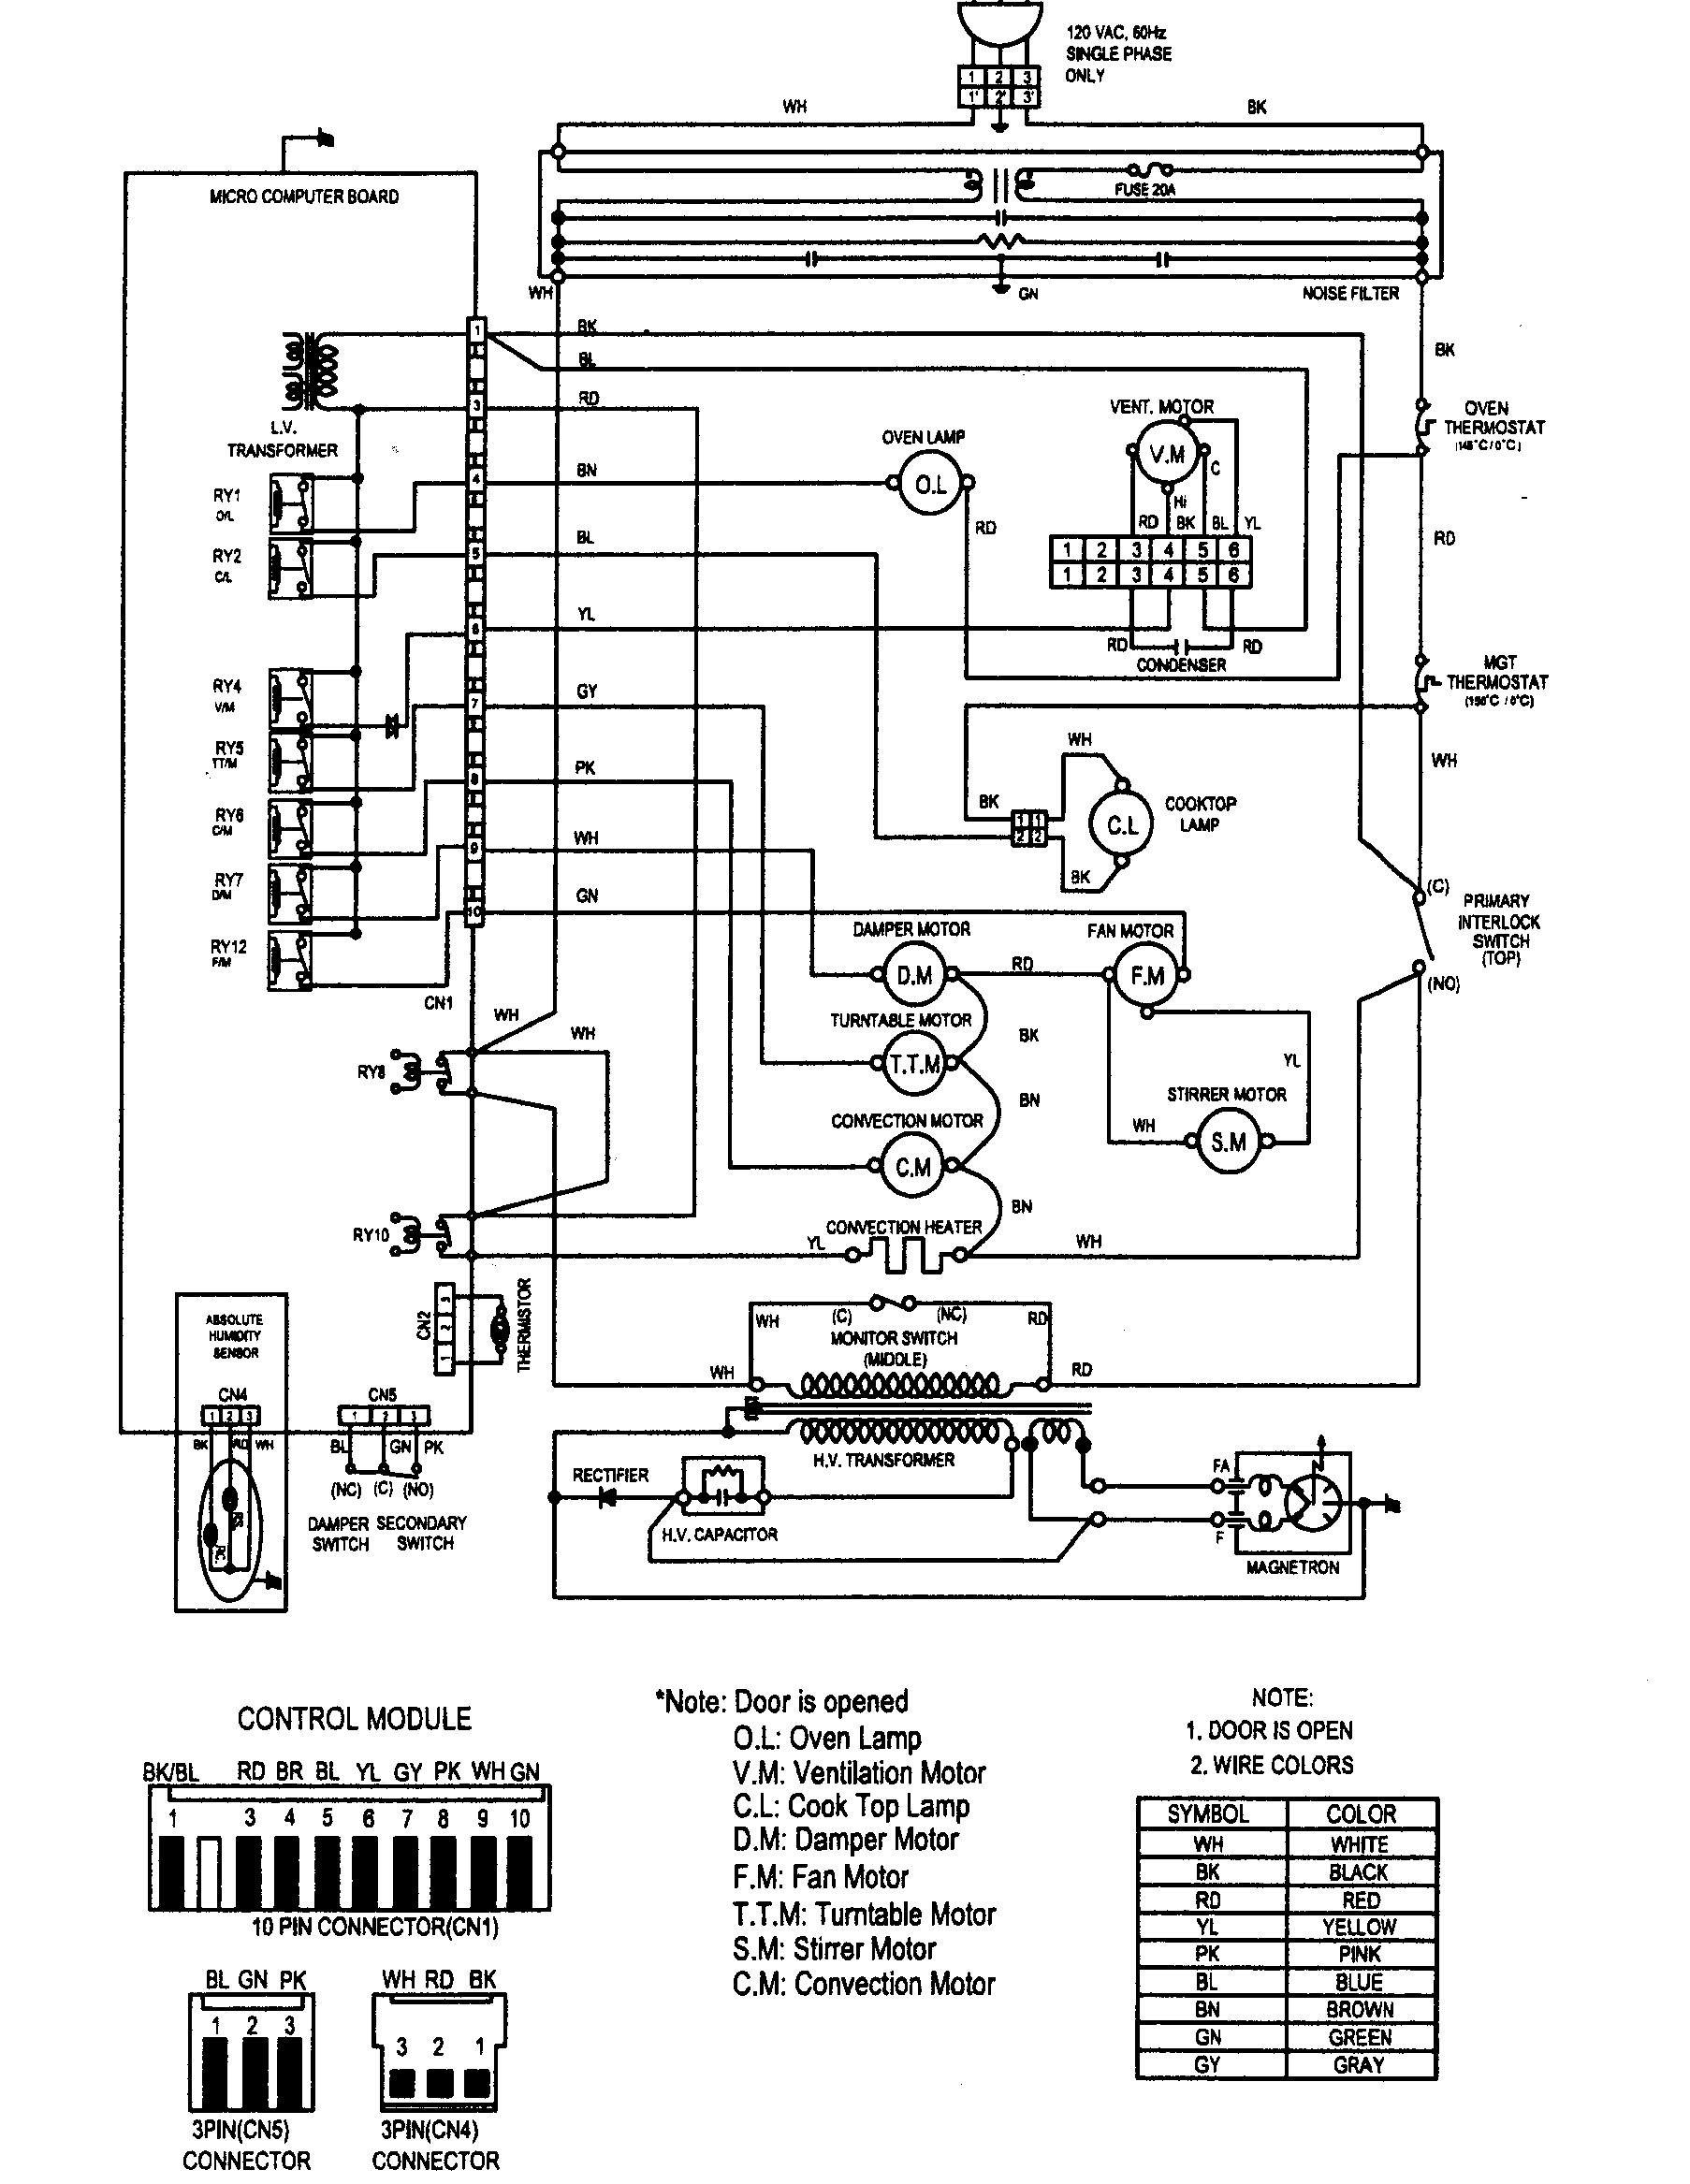 Wiring Diagram For Kenmore Elite Refrigerator Copy Best